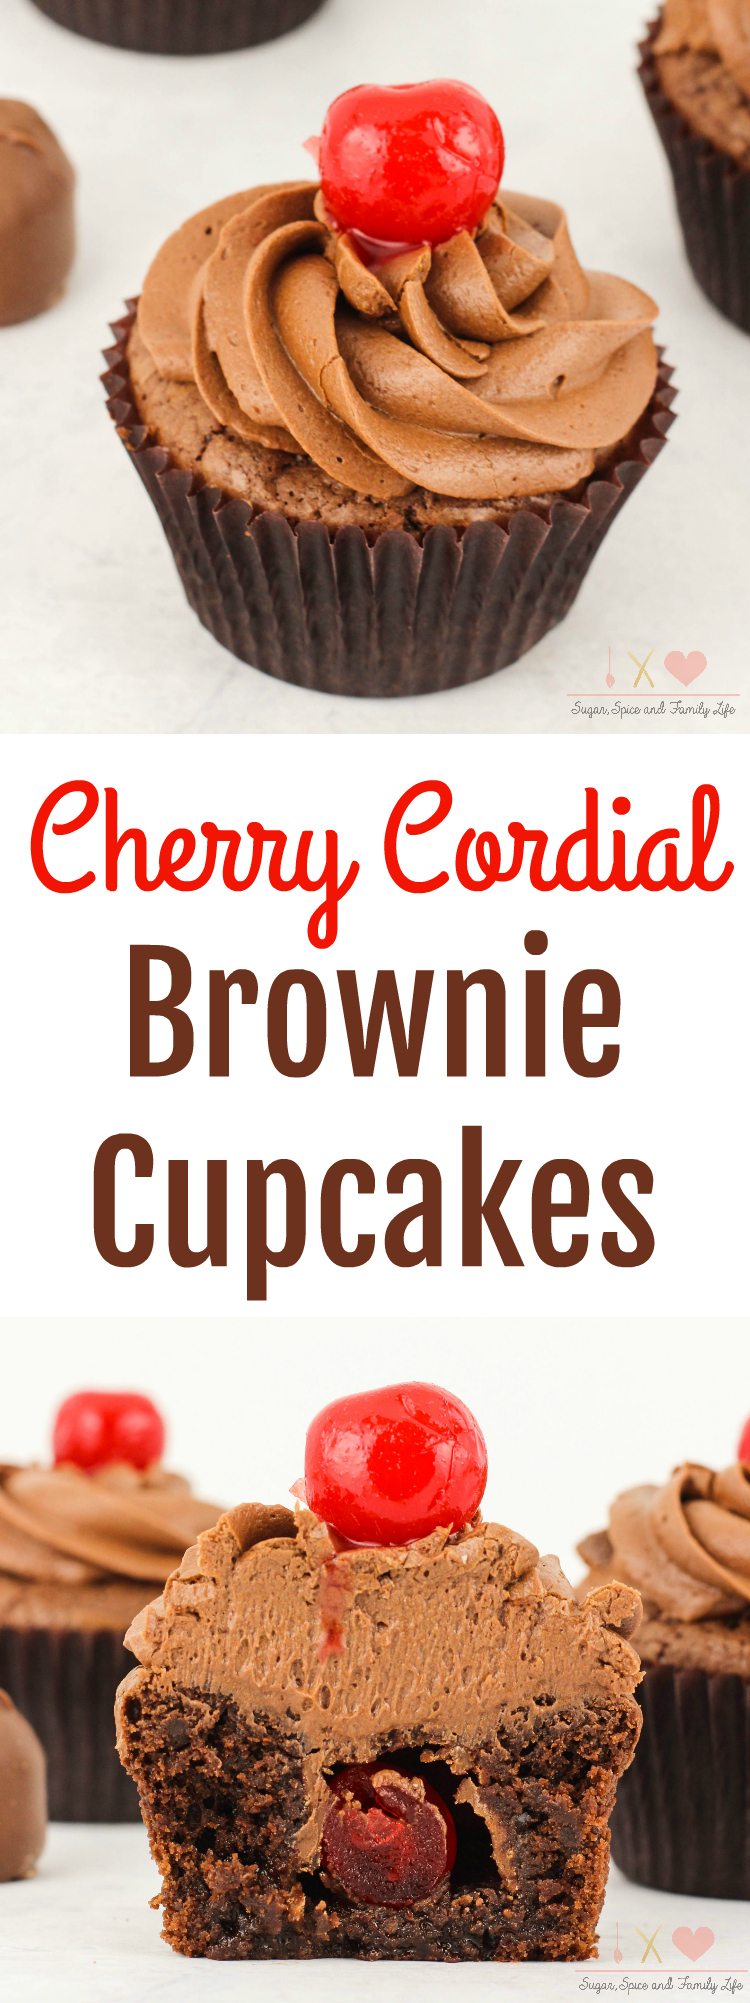 Cherry Cordial Brownie Cupcakes Recipe